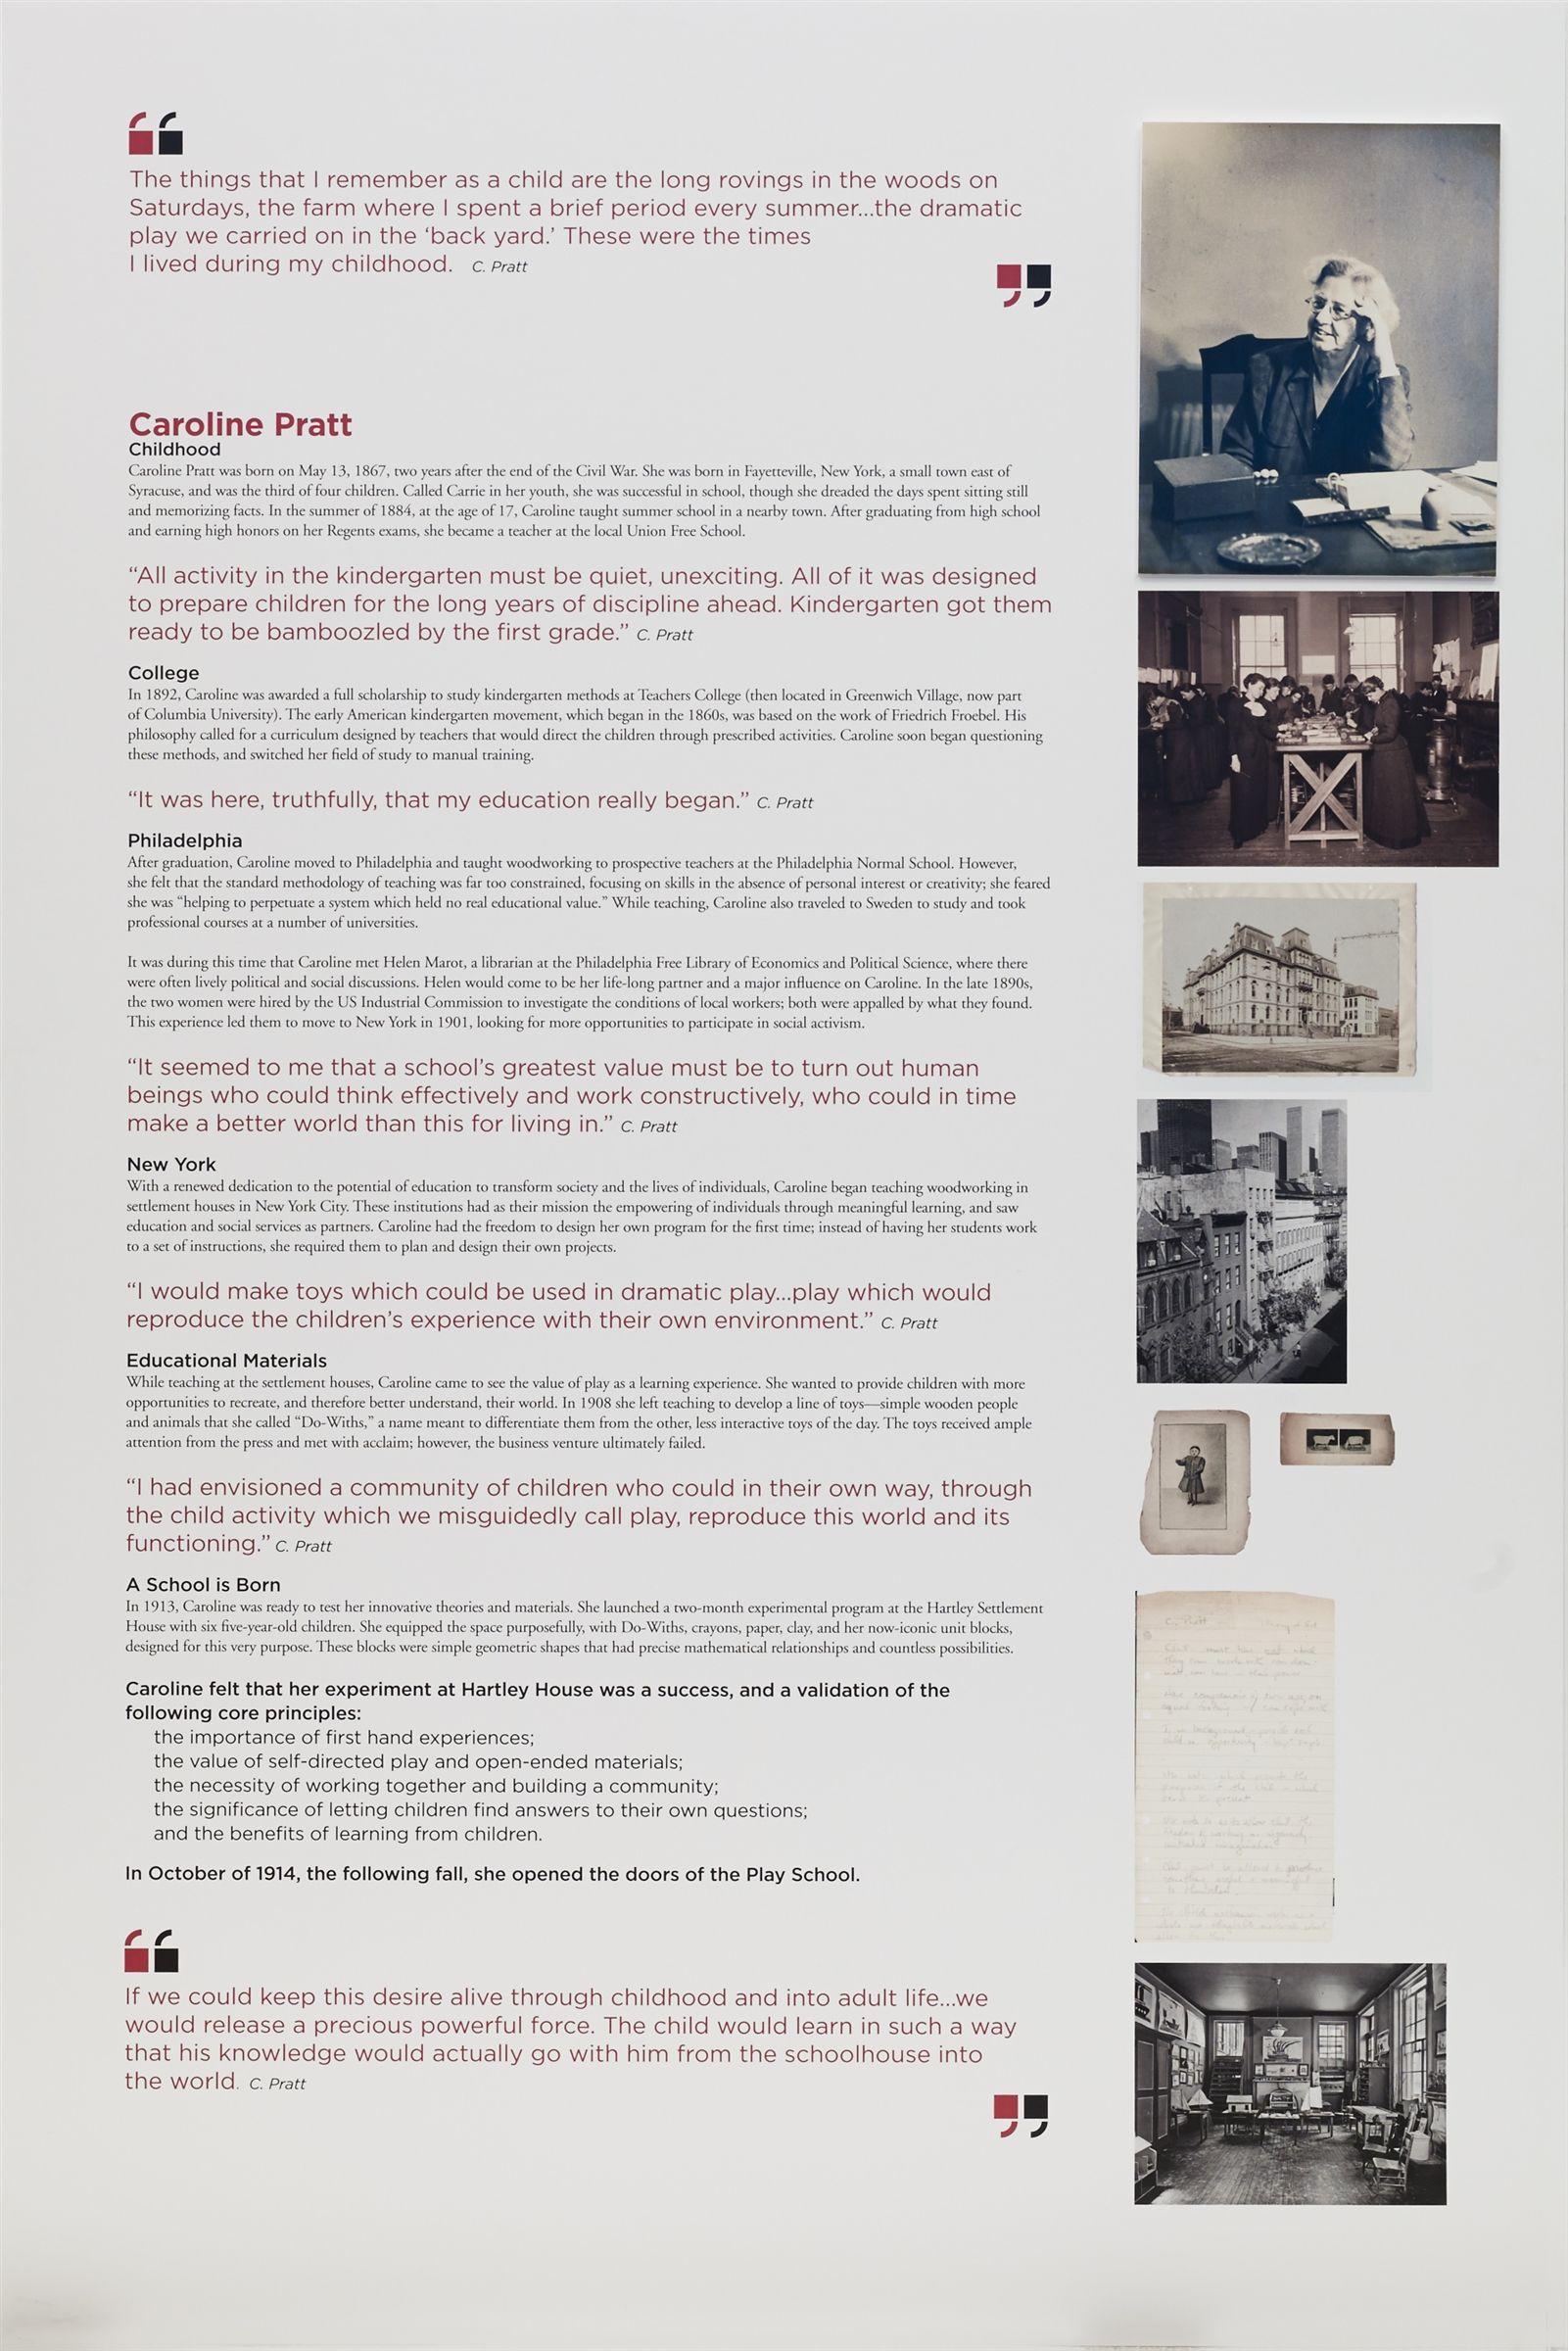 History of Greenwich Village